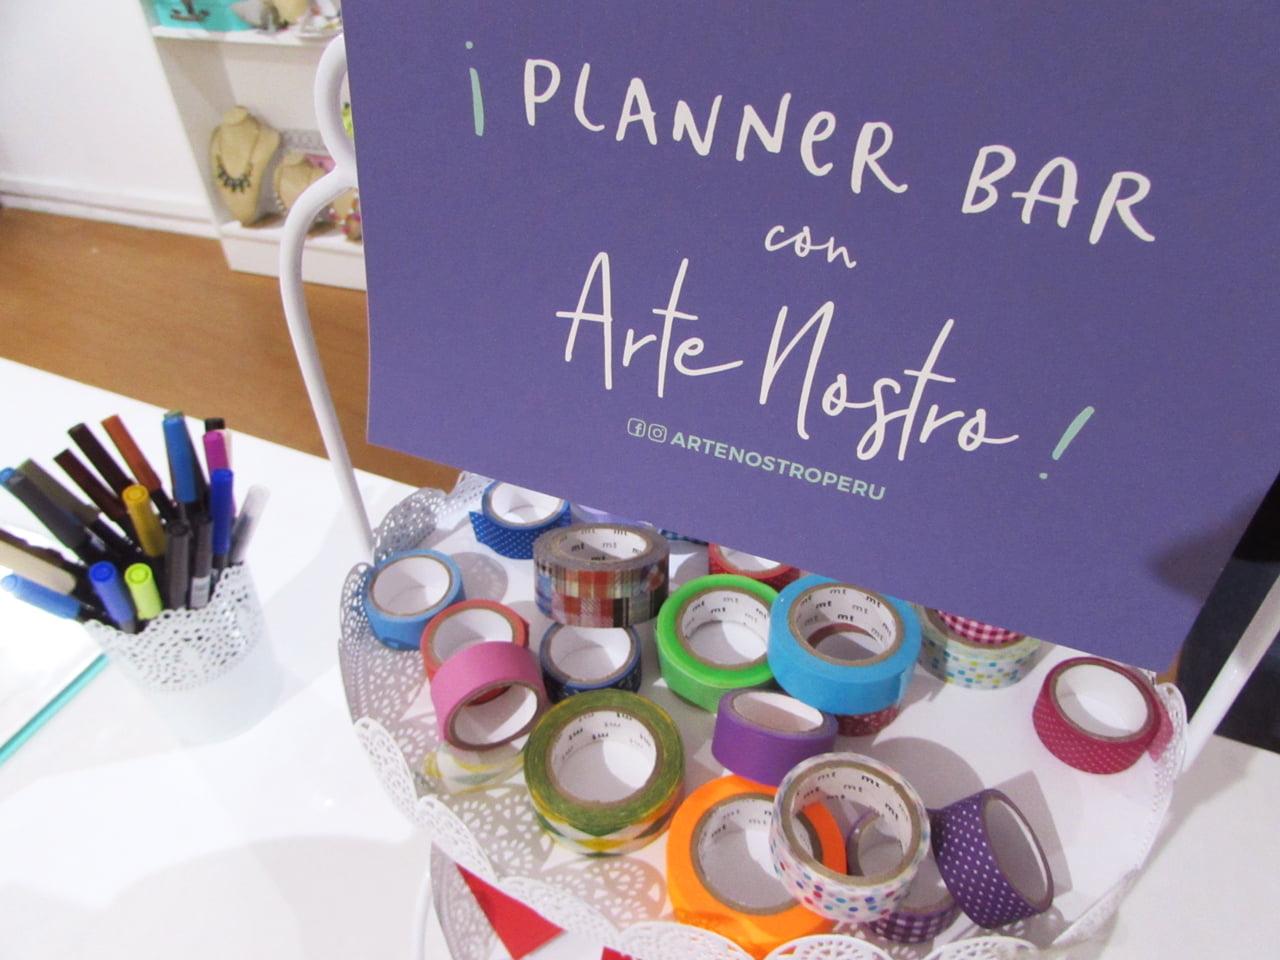 AgenDATE Letrero, washi tapes y tombows de Planner Bar por Arte Nostro